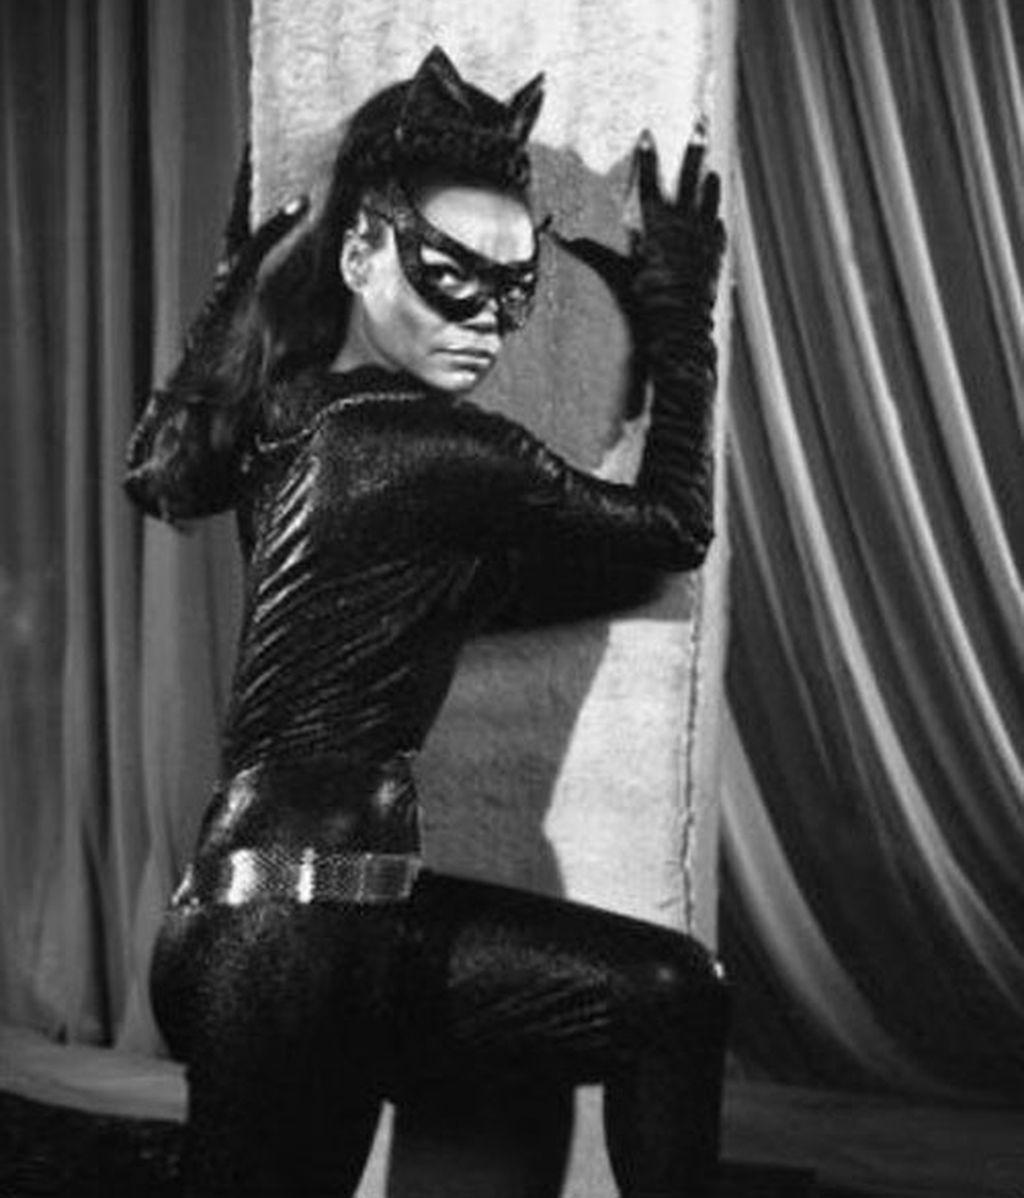 ¿Quién crees que ha sido la mejor Catwoman de la historia?